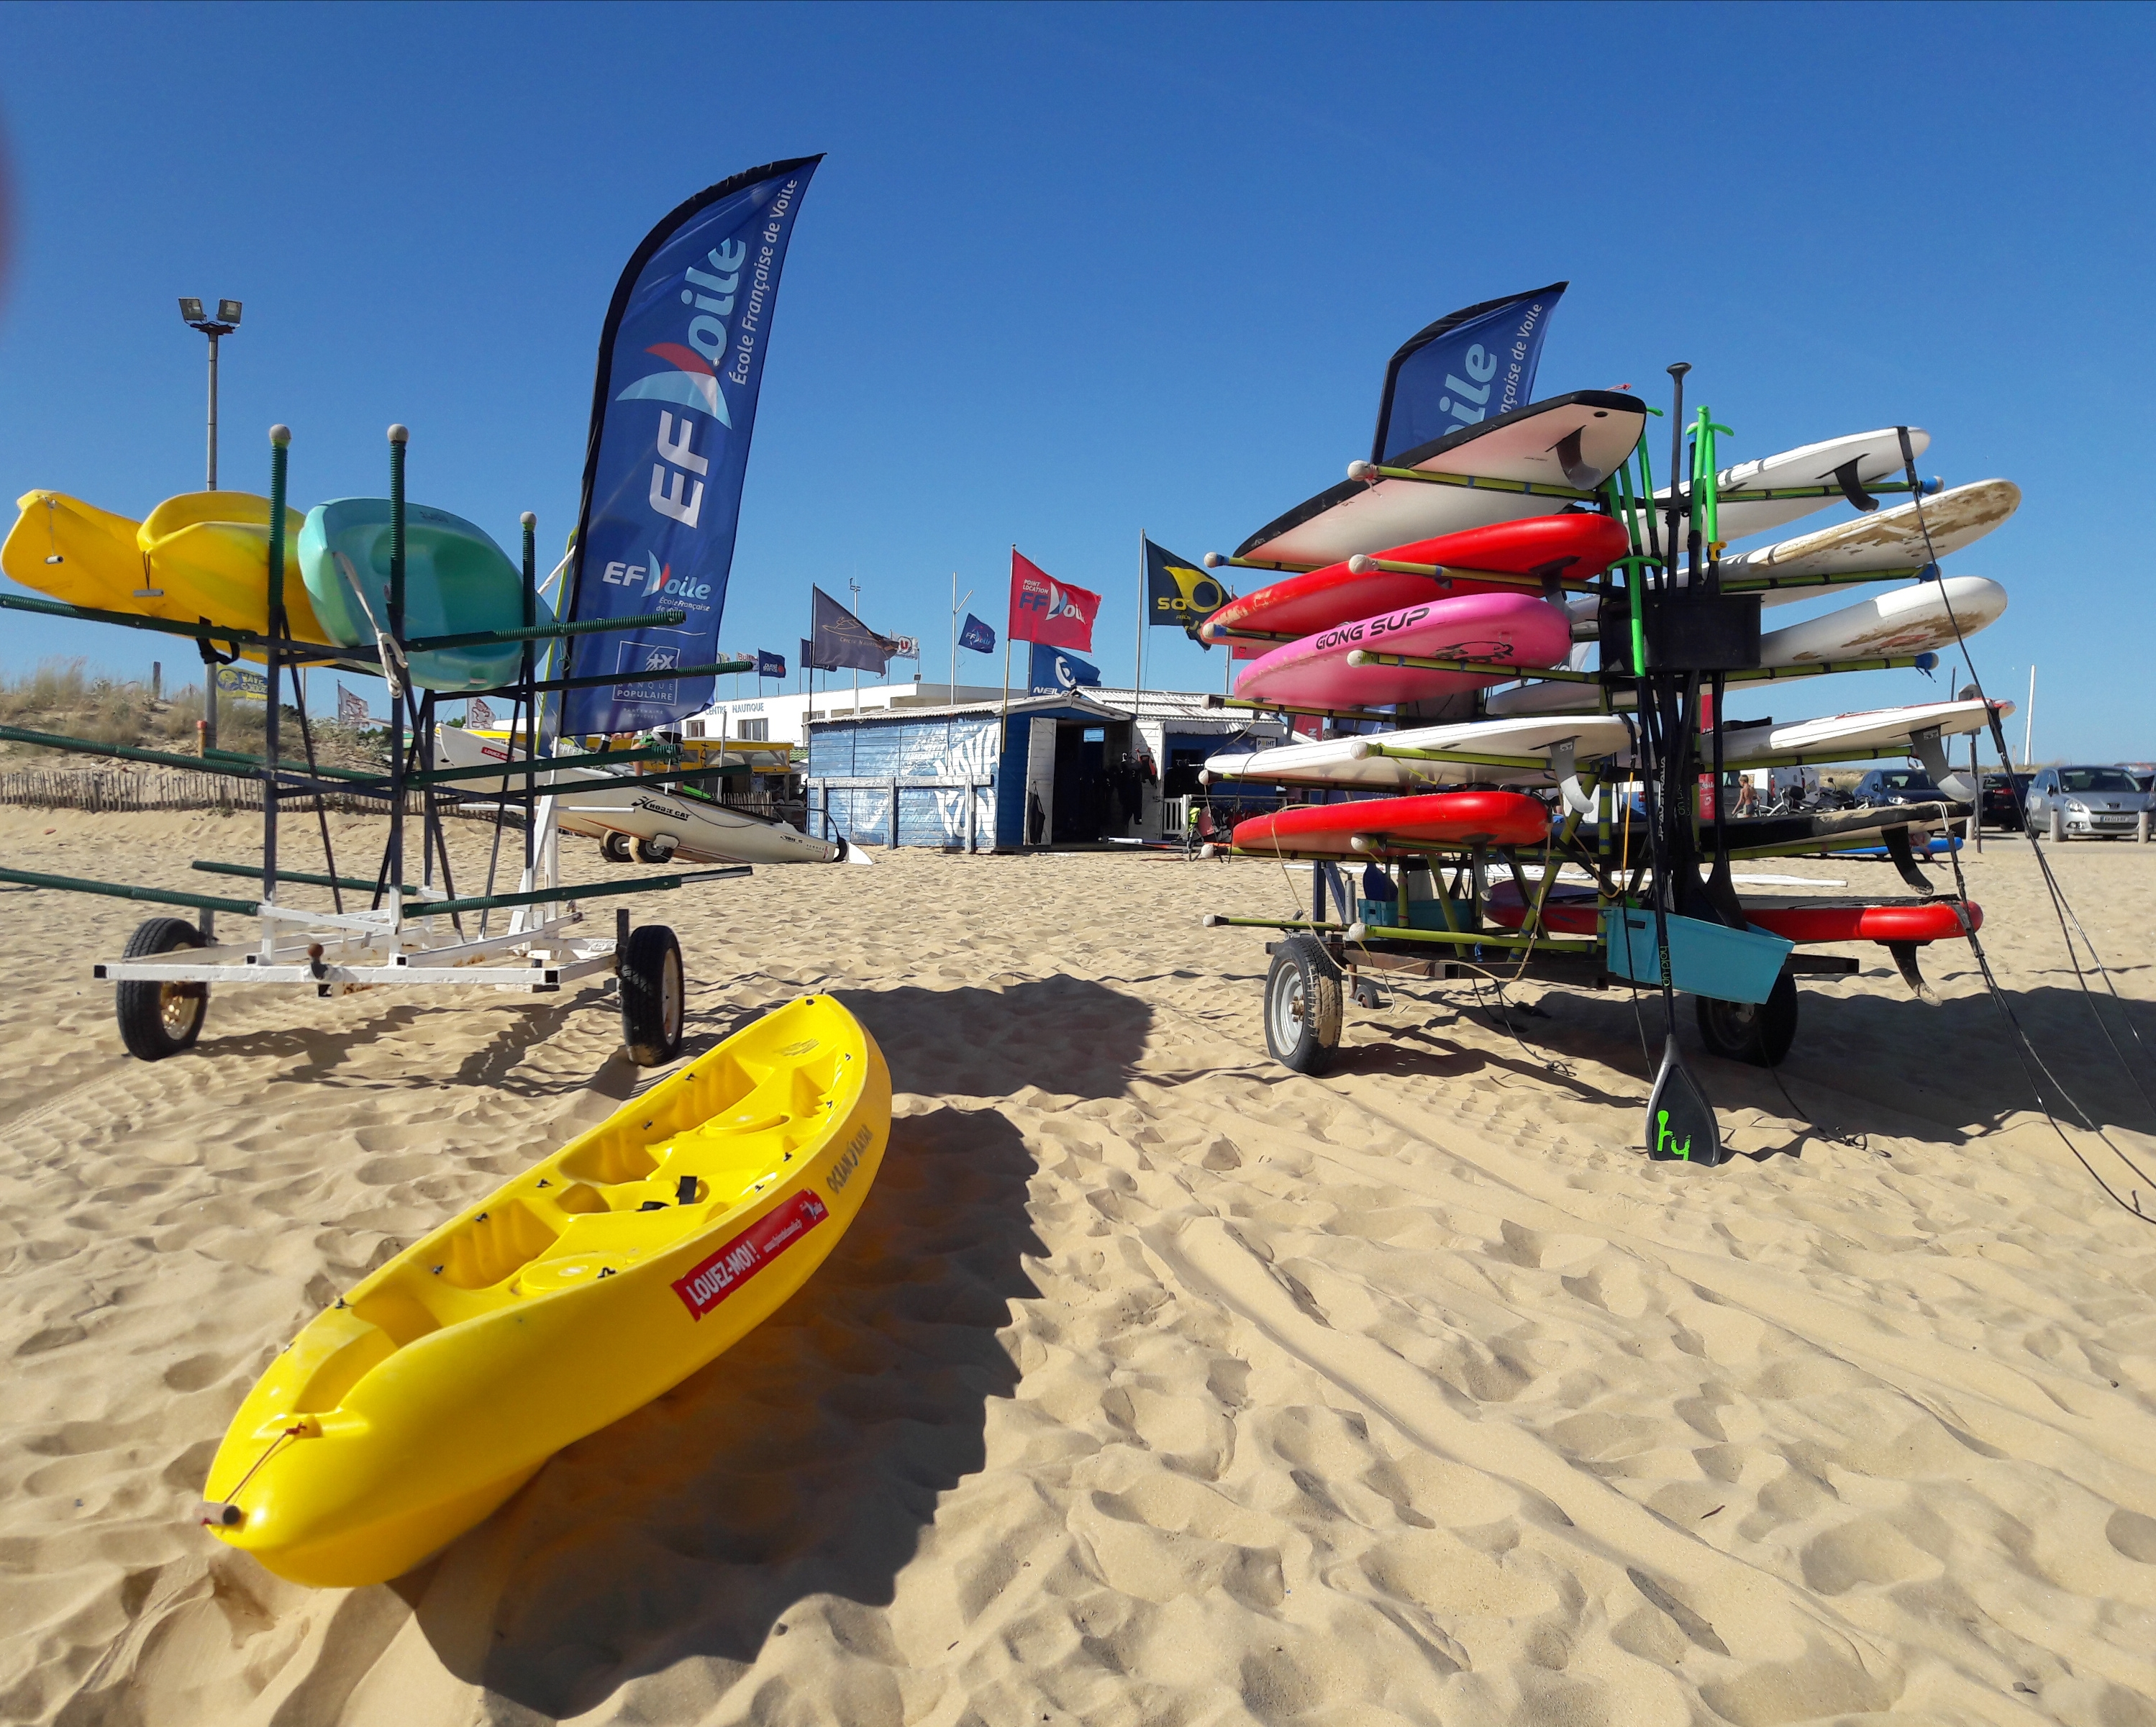 Rental of sea kayaks in the Marais Poitevin Regional Nature Park